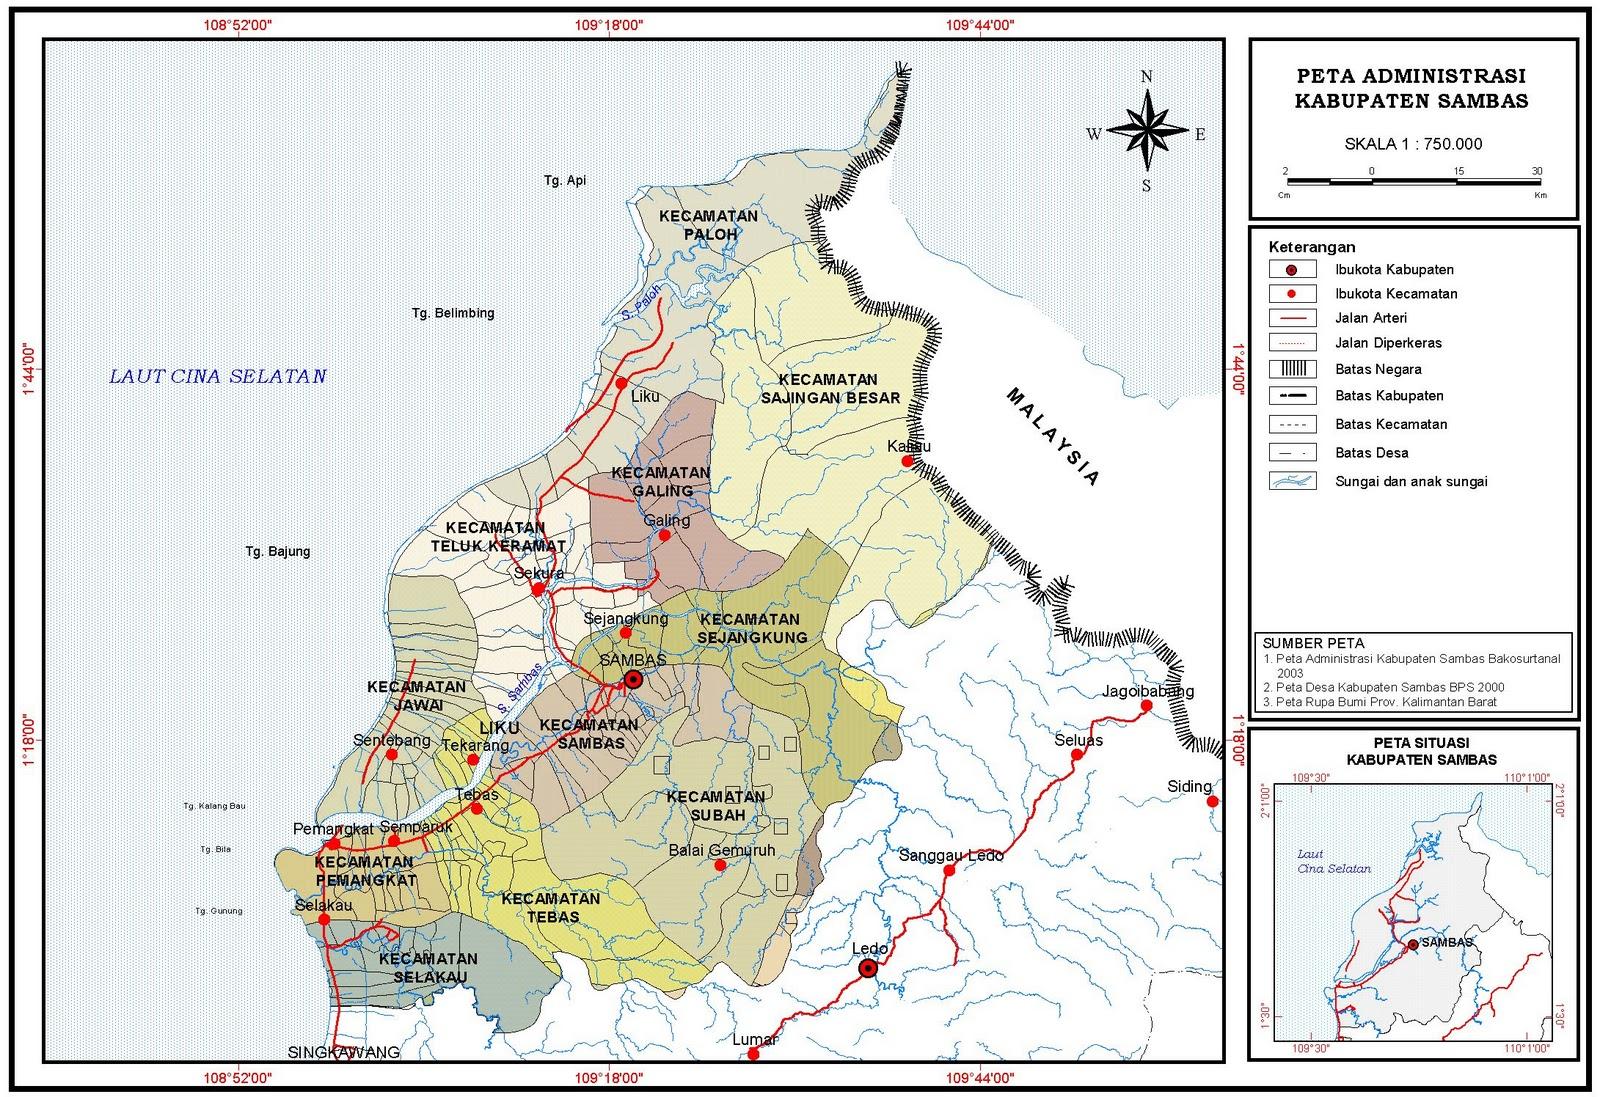 Peta Kota: Peta Kabupaten Sambas